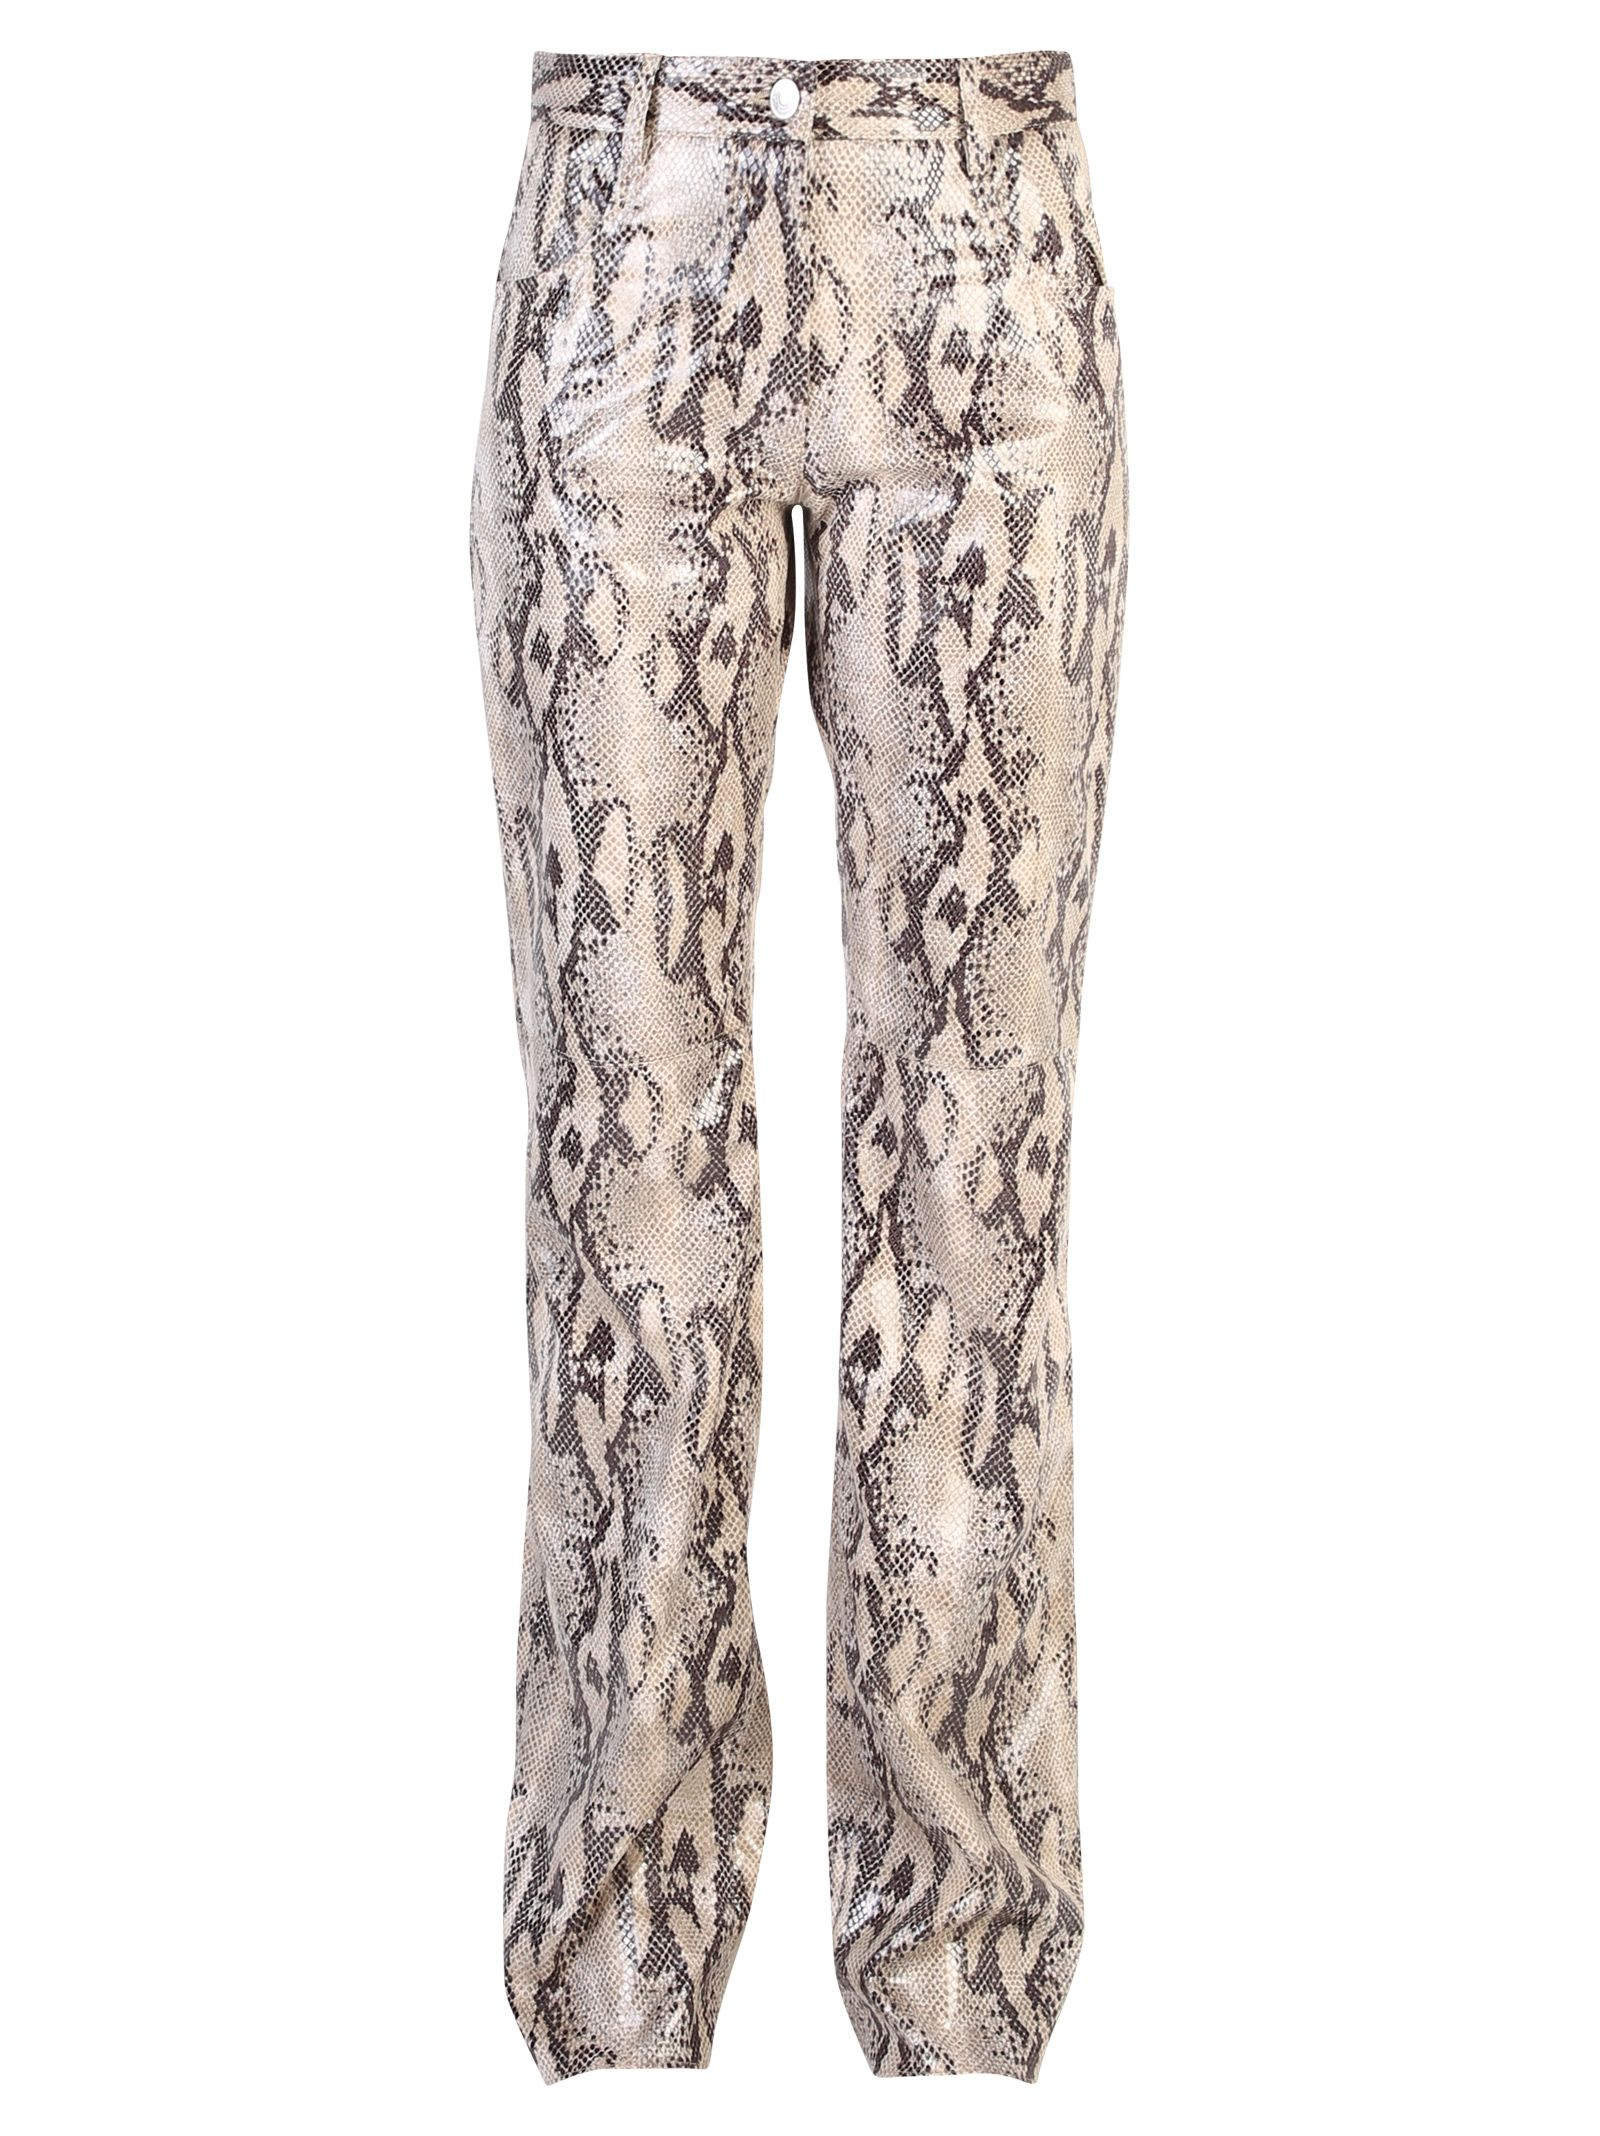 Beige Printed Trousers